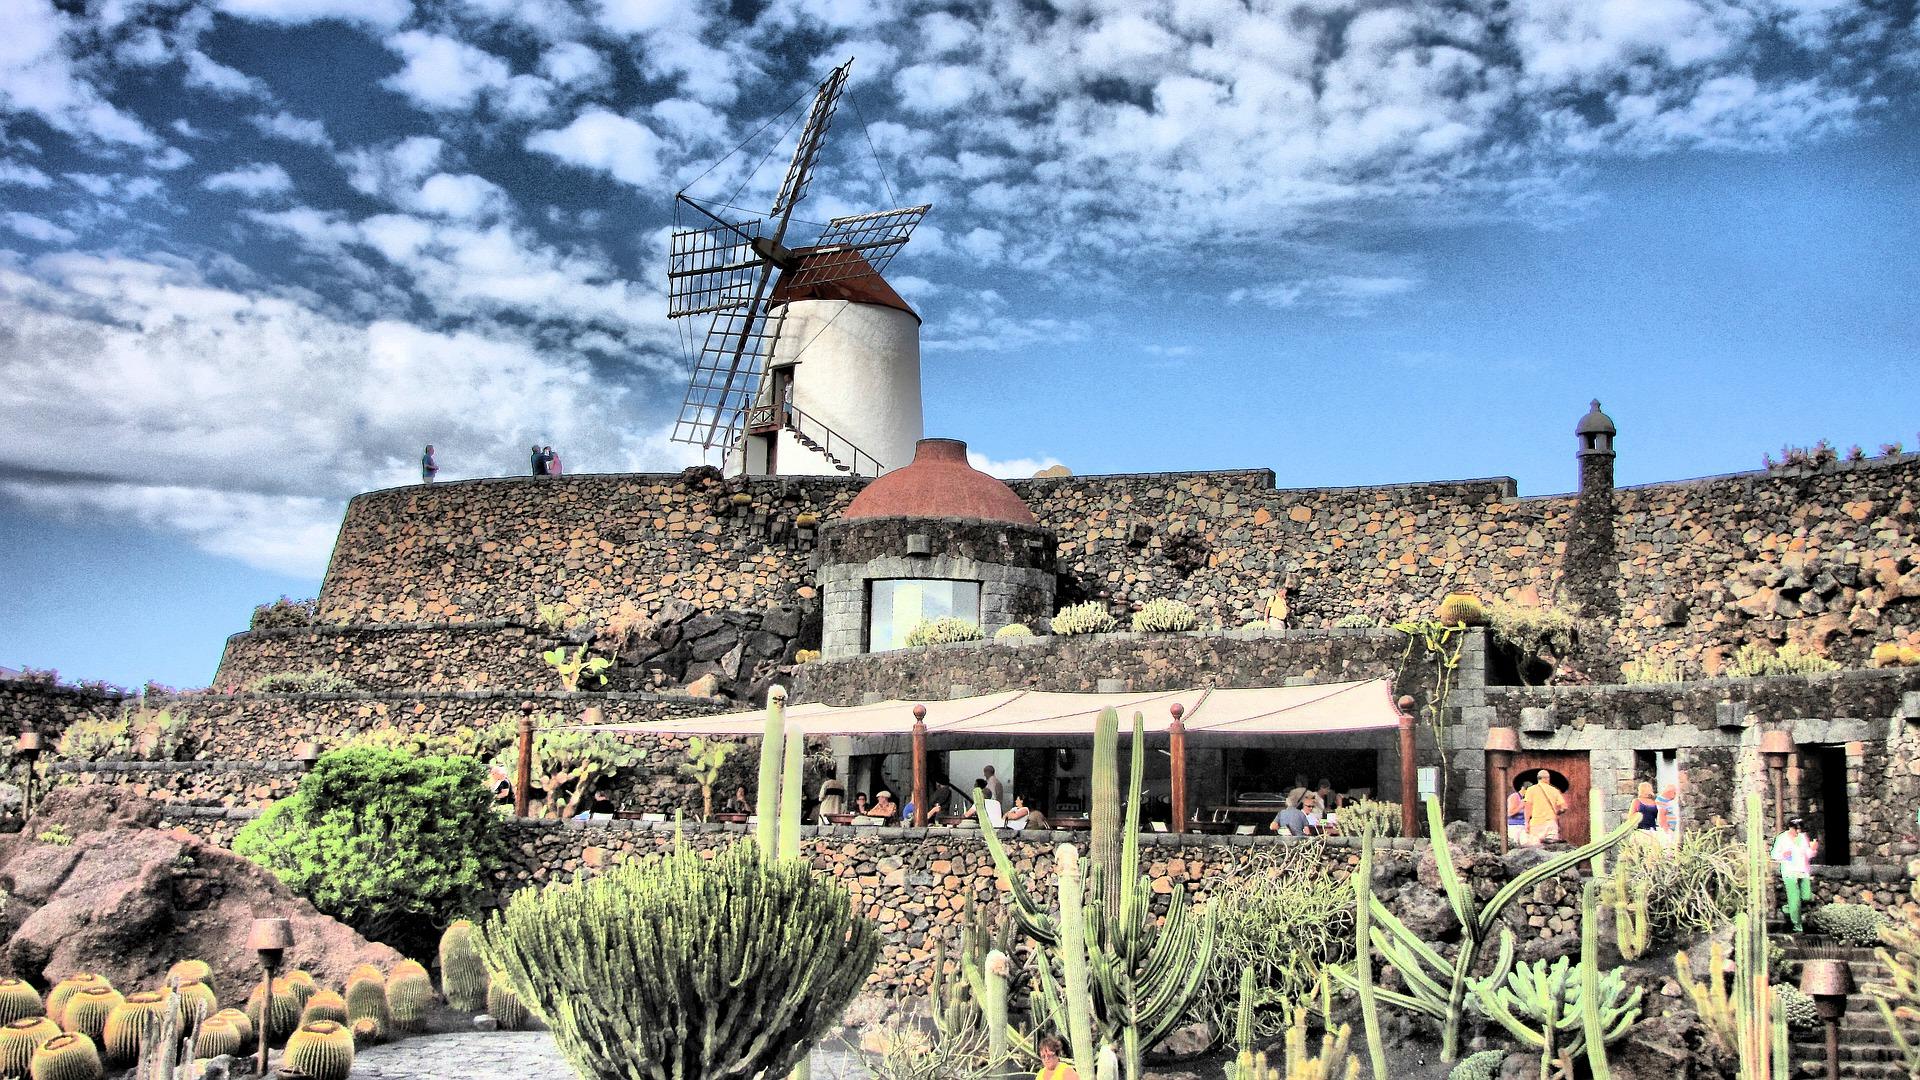 Windmill, Cactus Garden Lanzarote